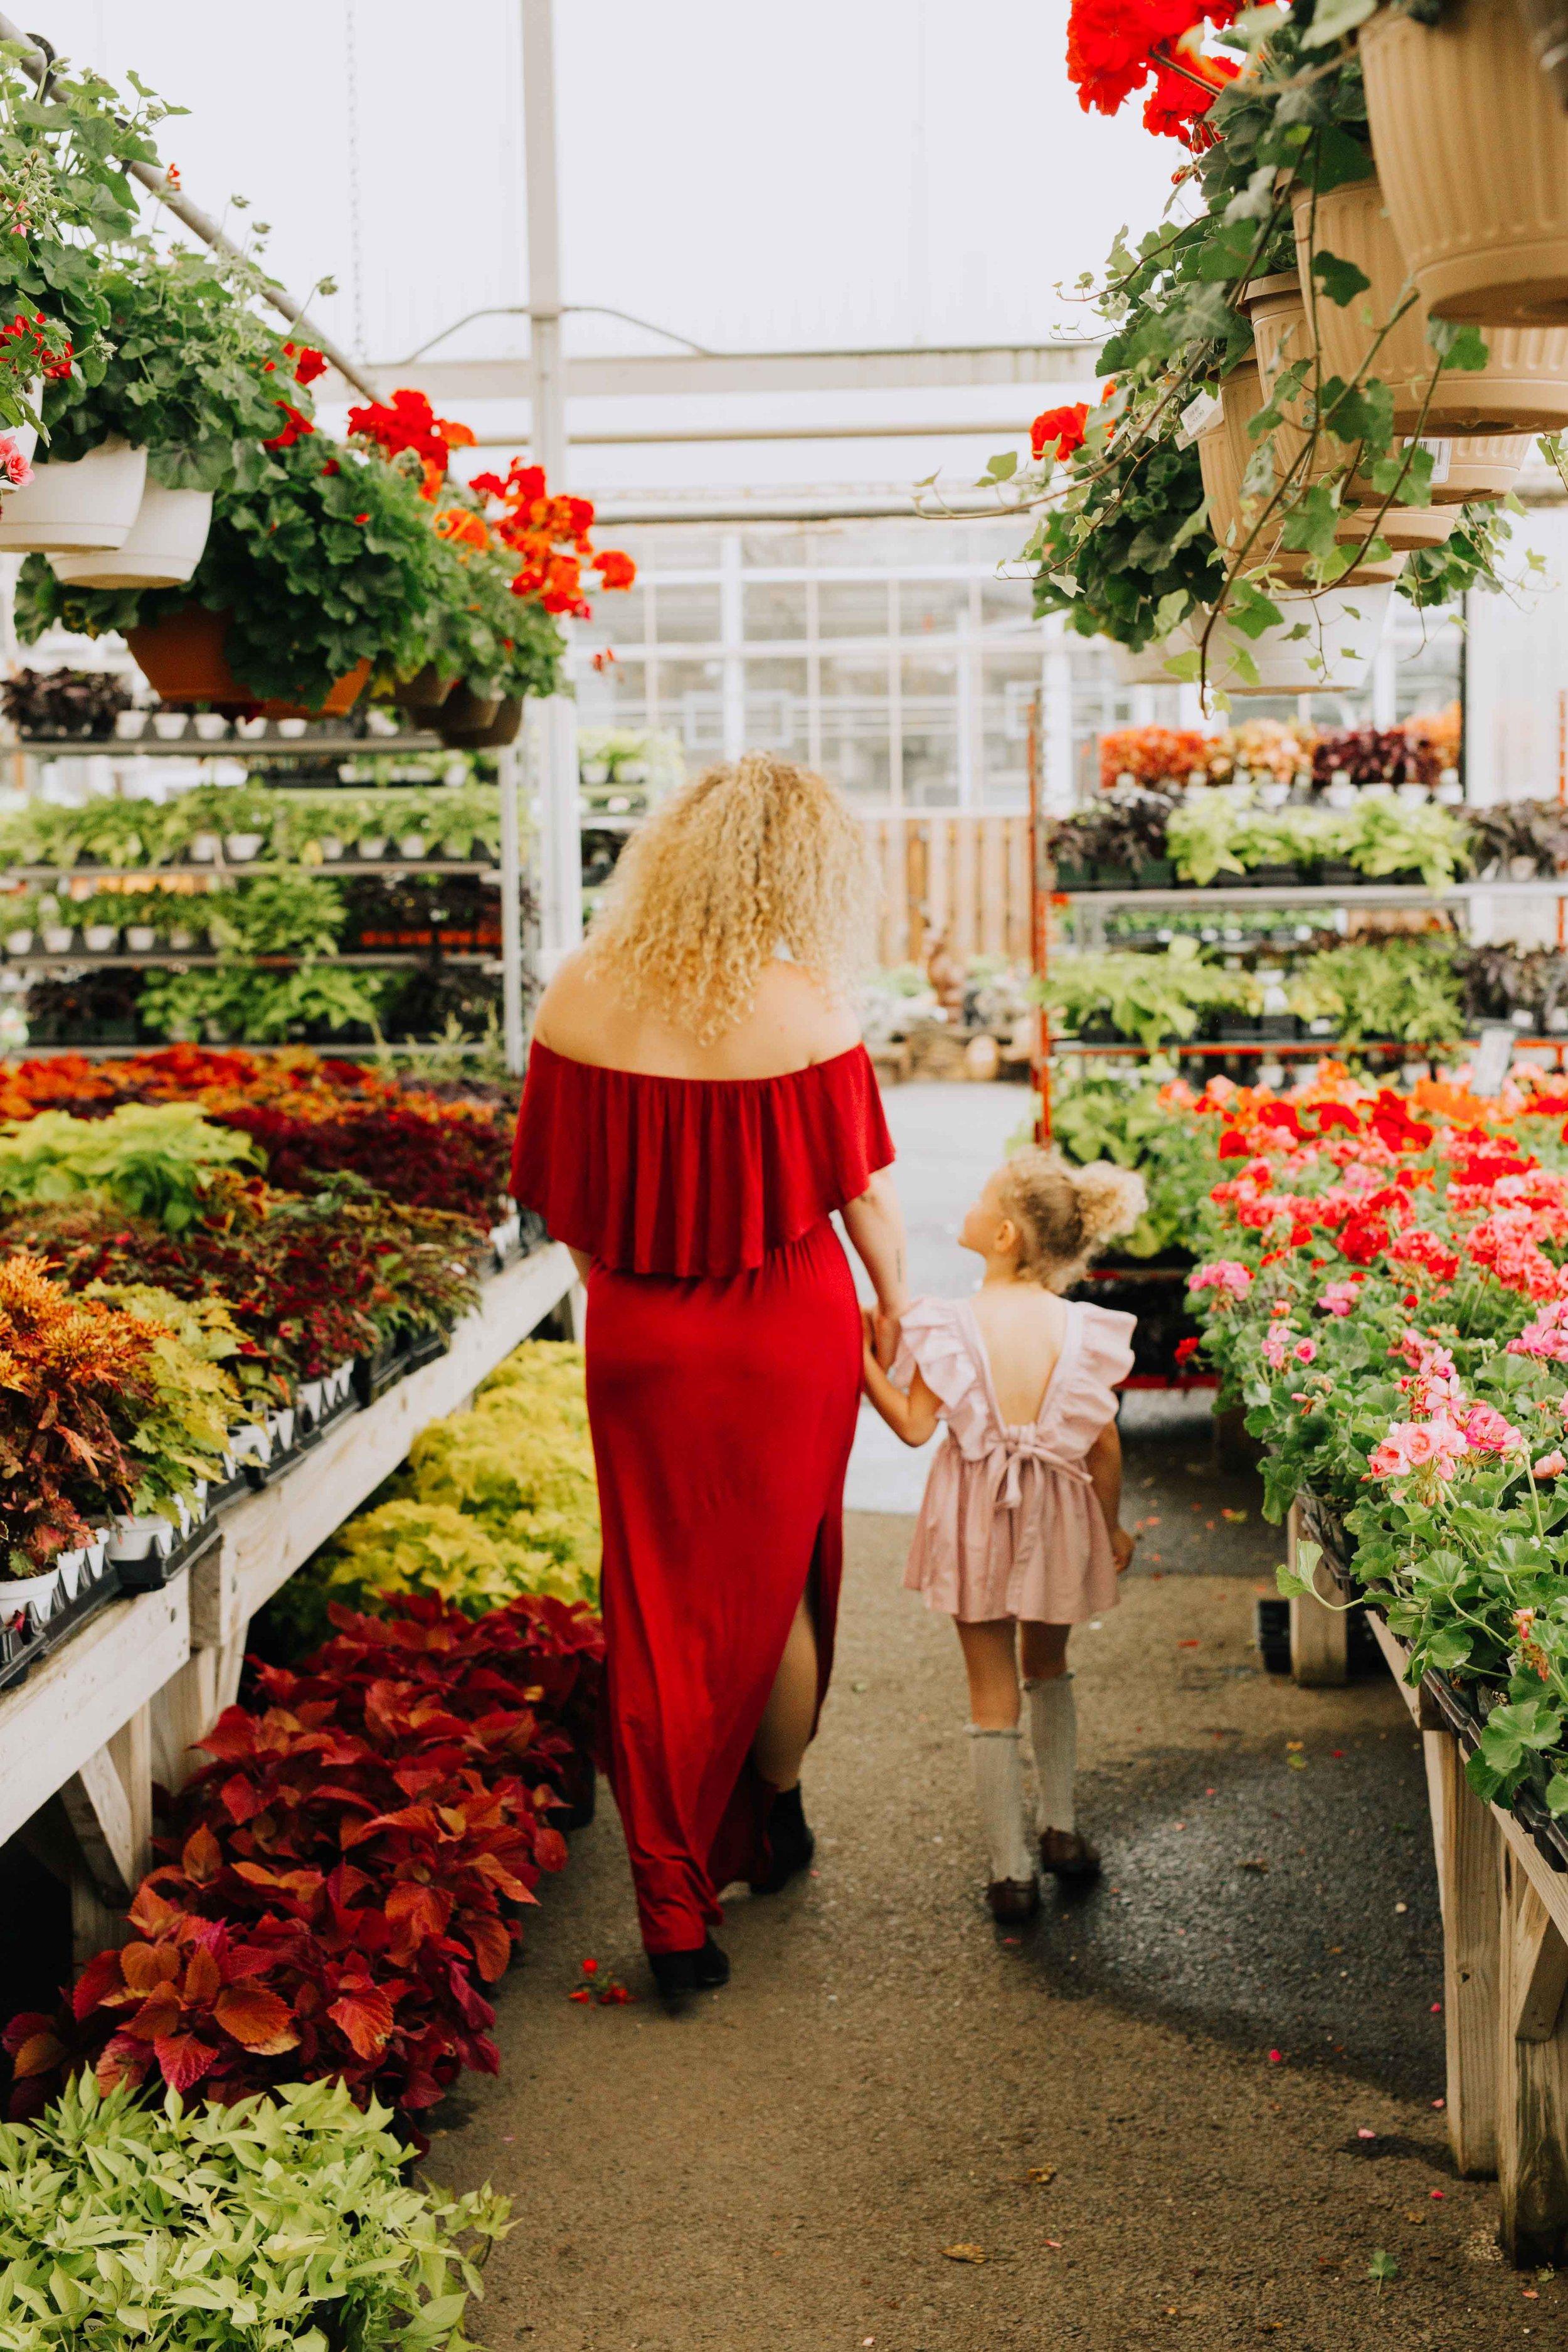 Merrifield-garden-greenhouse-indoor-Jacqueline-Waters-Photography-Red-dress-family- (231).jpg